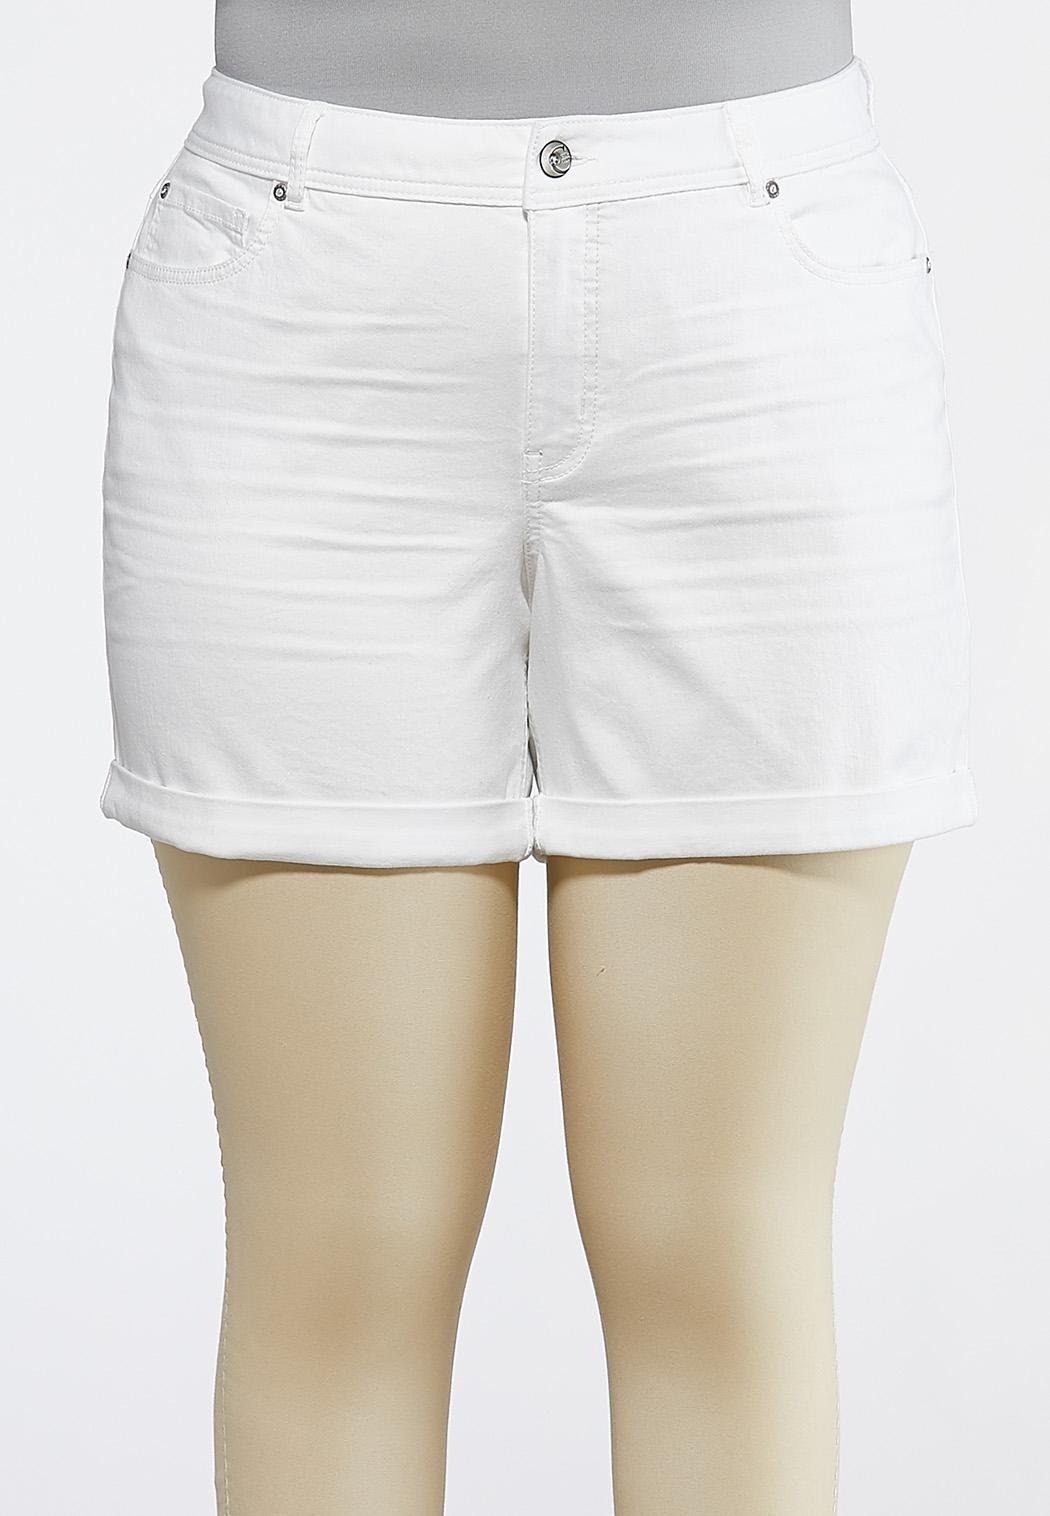 Plus Size White Denim Cuffed Shorts